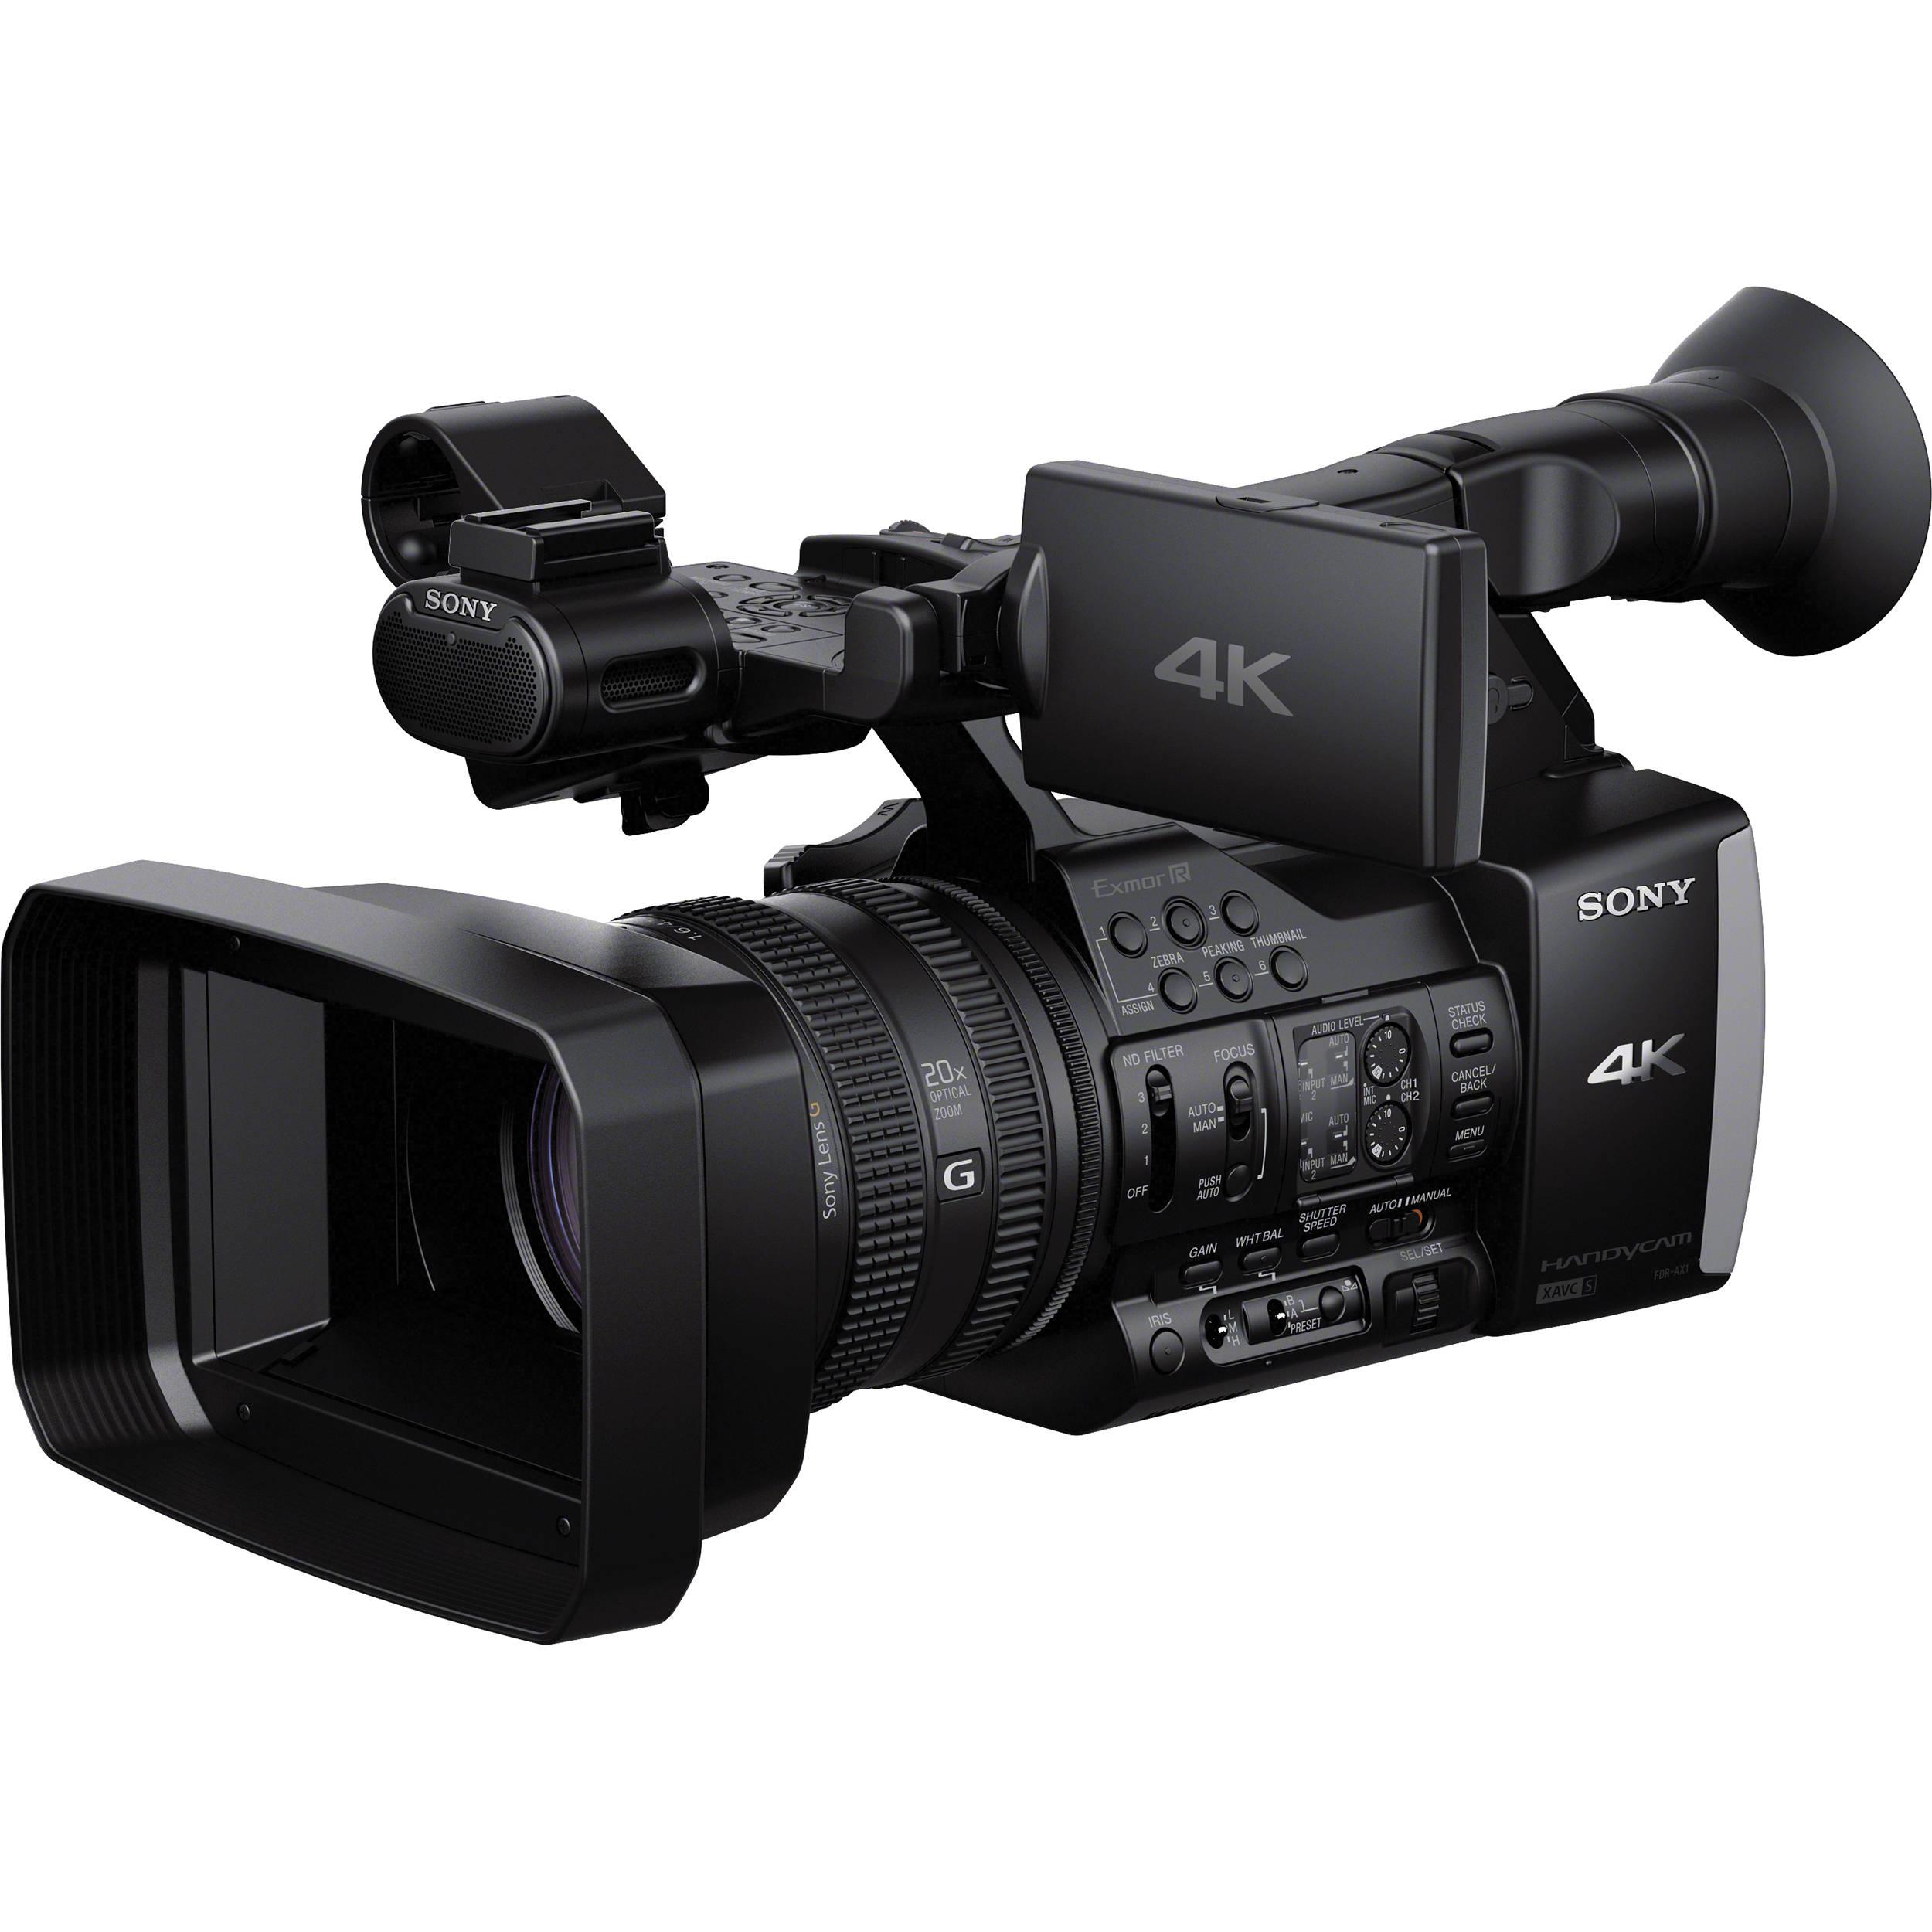 Camera recorder box